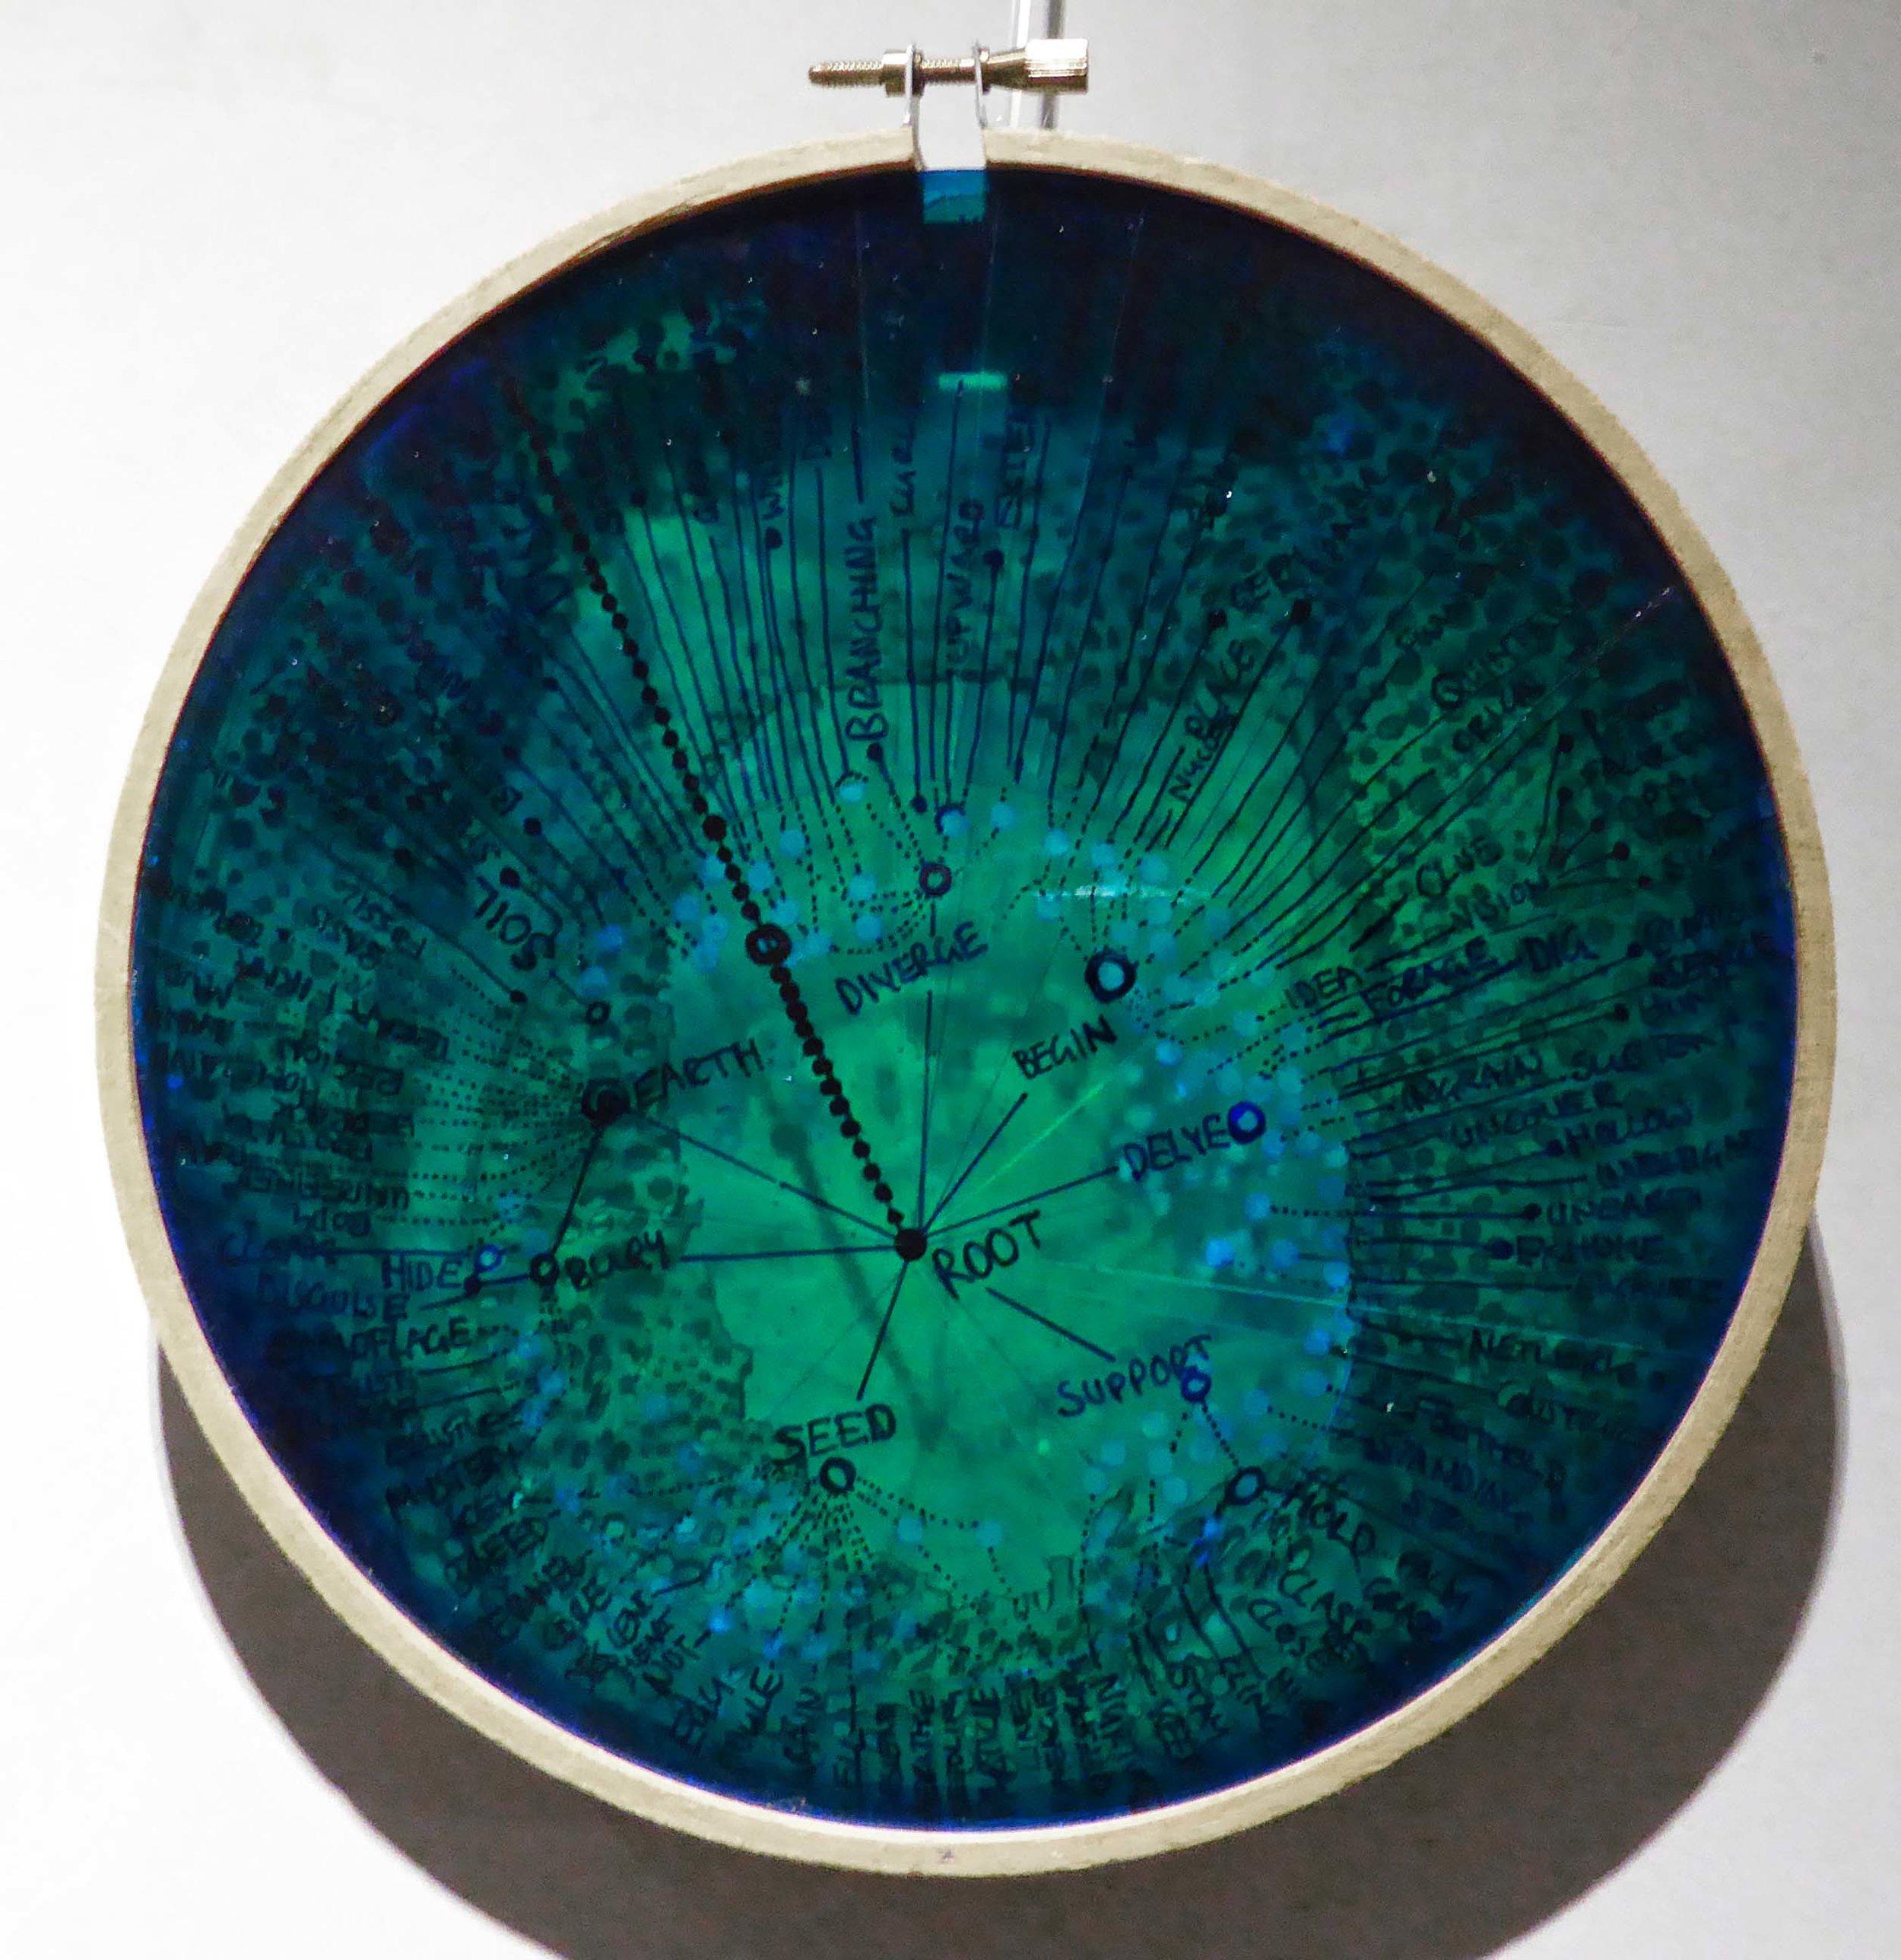 Constellation, Nicola Anthony, 2015, UK